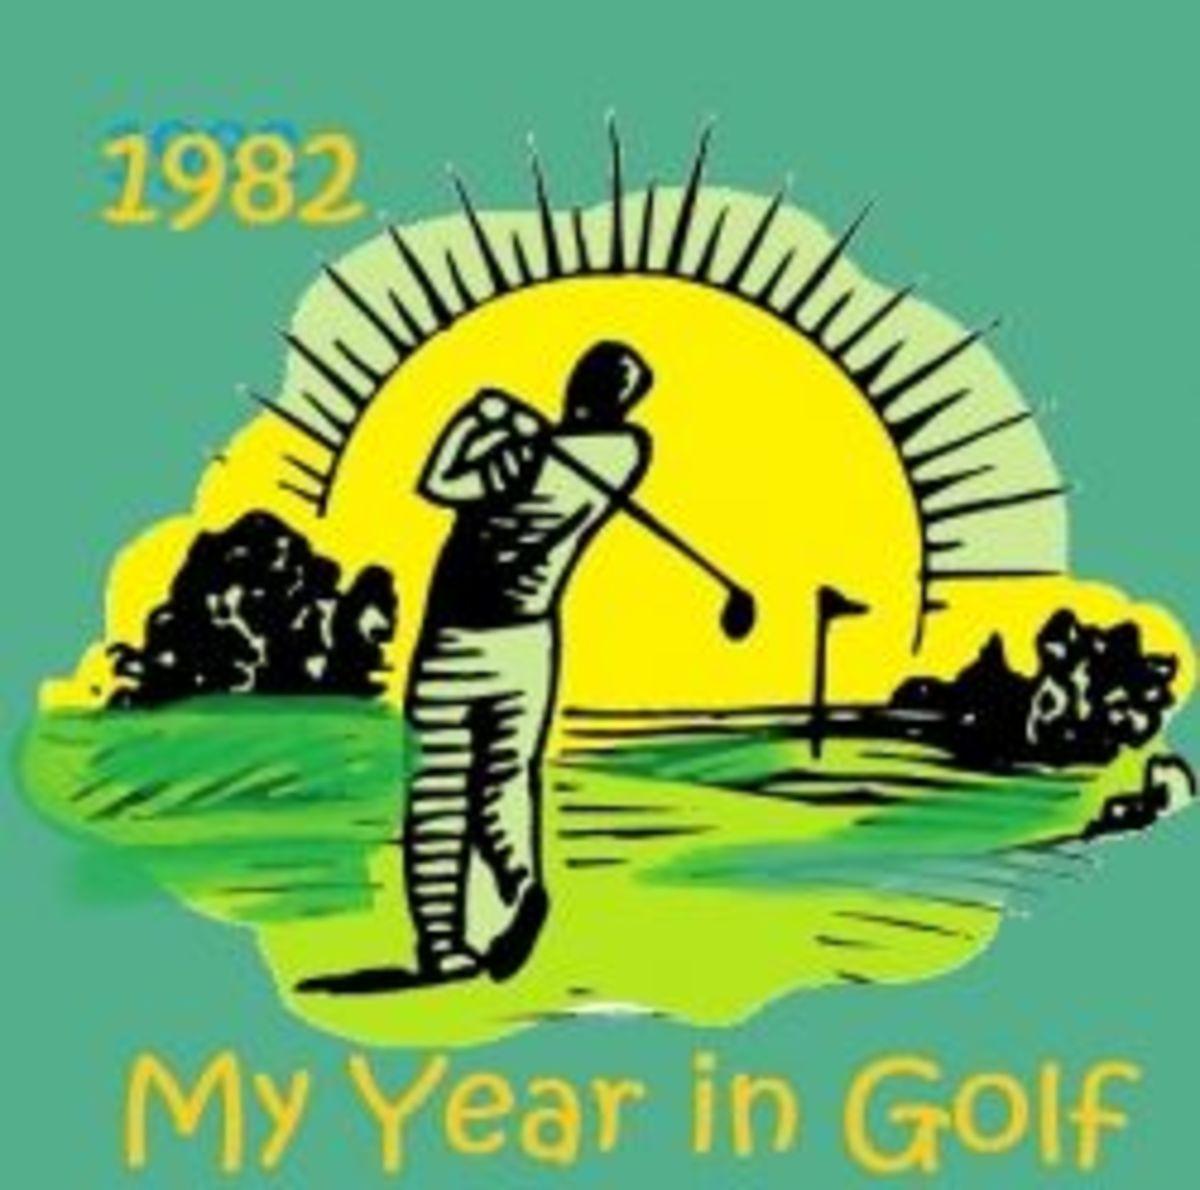 1982 My year in golf